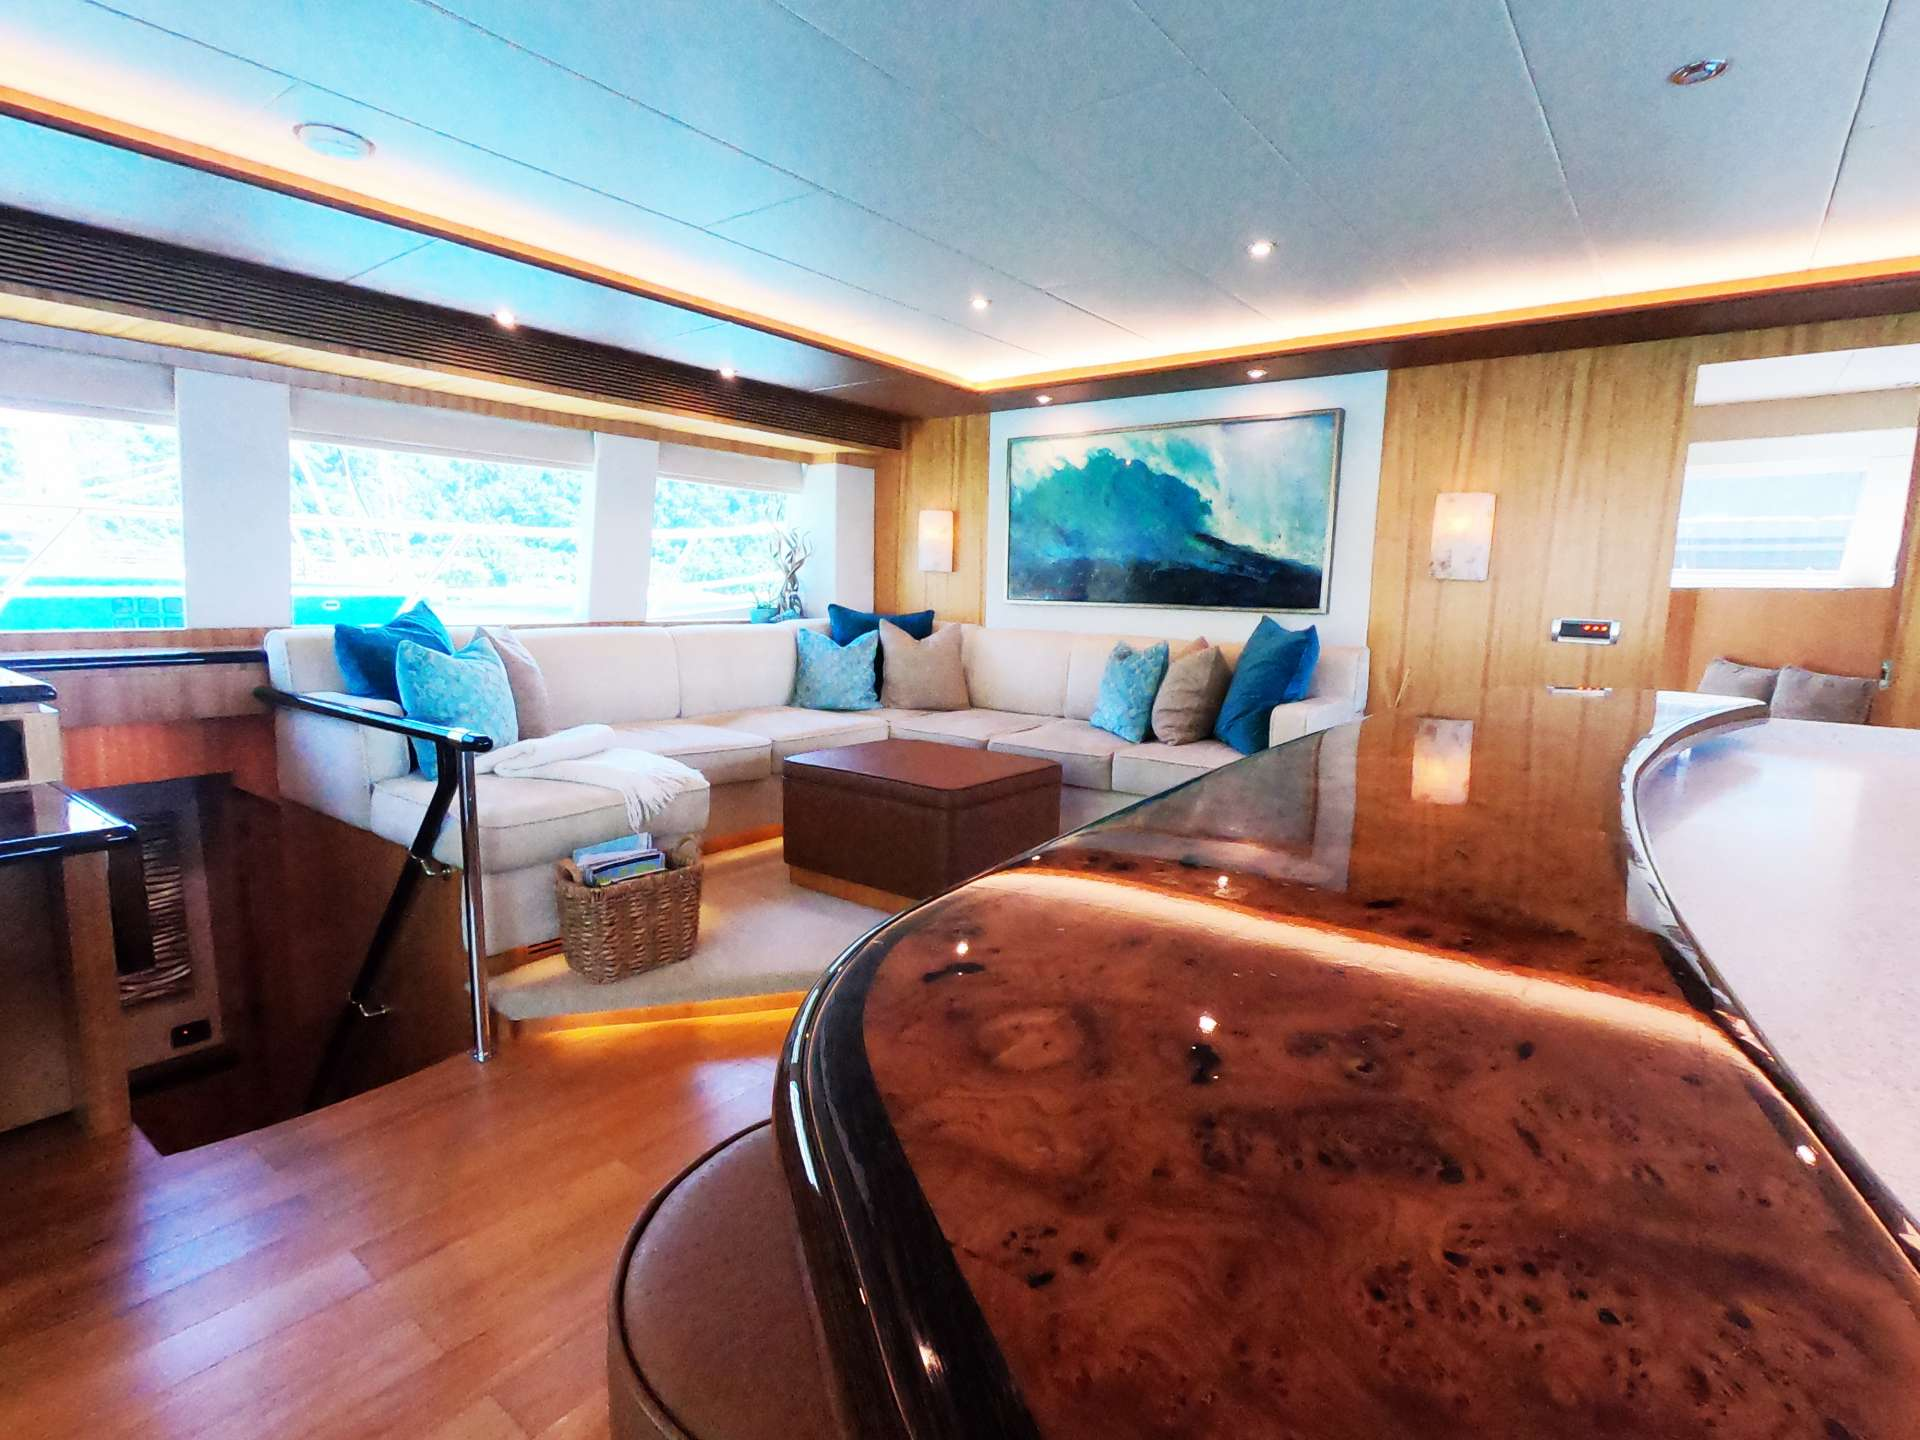 Cat Yacht 'Cat', 6 PAX, 2 Crew, 60.00 Ft, 18.00 Meters, Built 2014, Horizon, Refit Year N/A